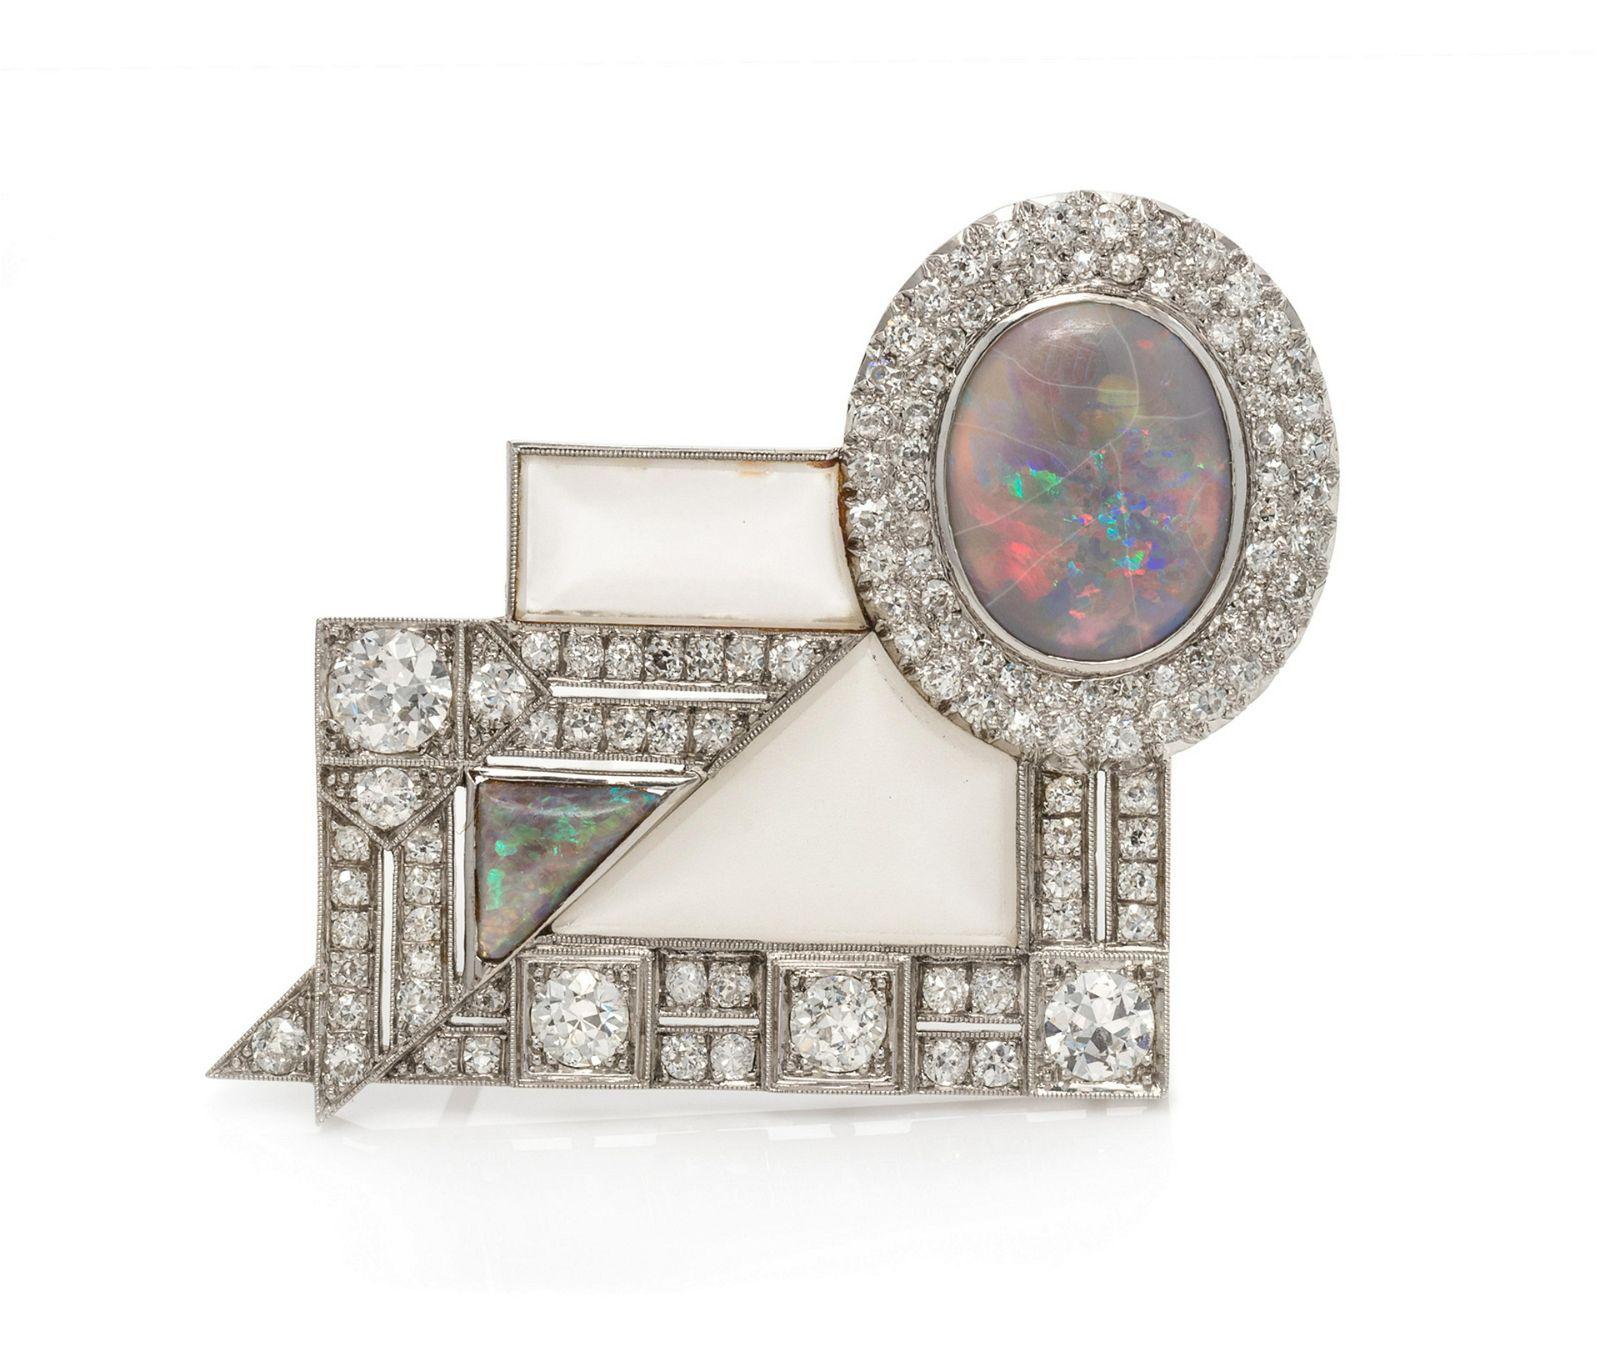 An Art Deco Platinum, Opal, Diamond and Rock Crystal